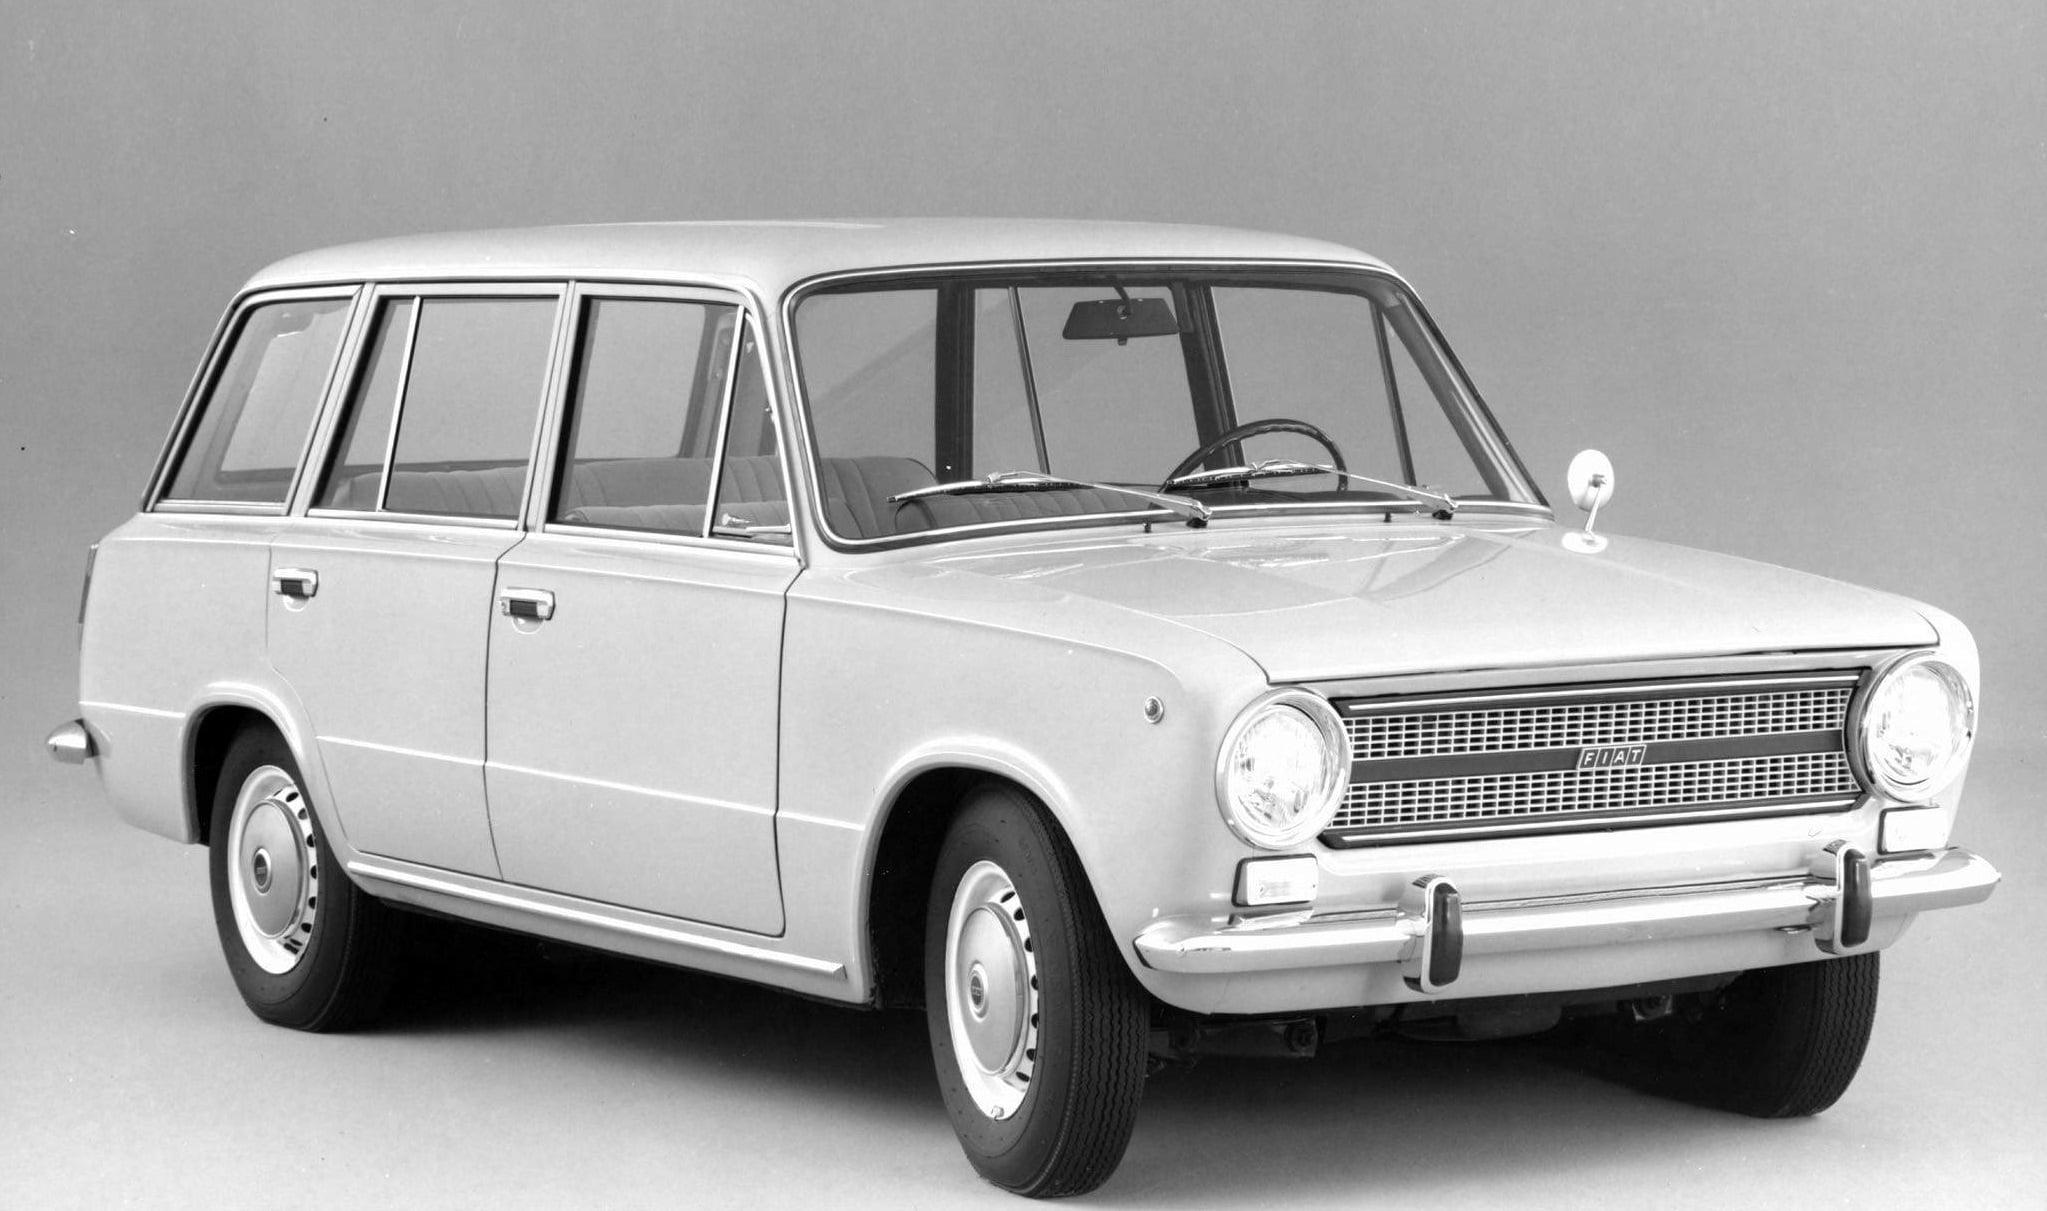 фото FIAT-124 Faniliare 1966 г